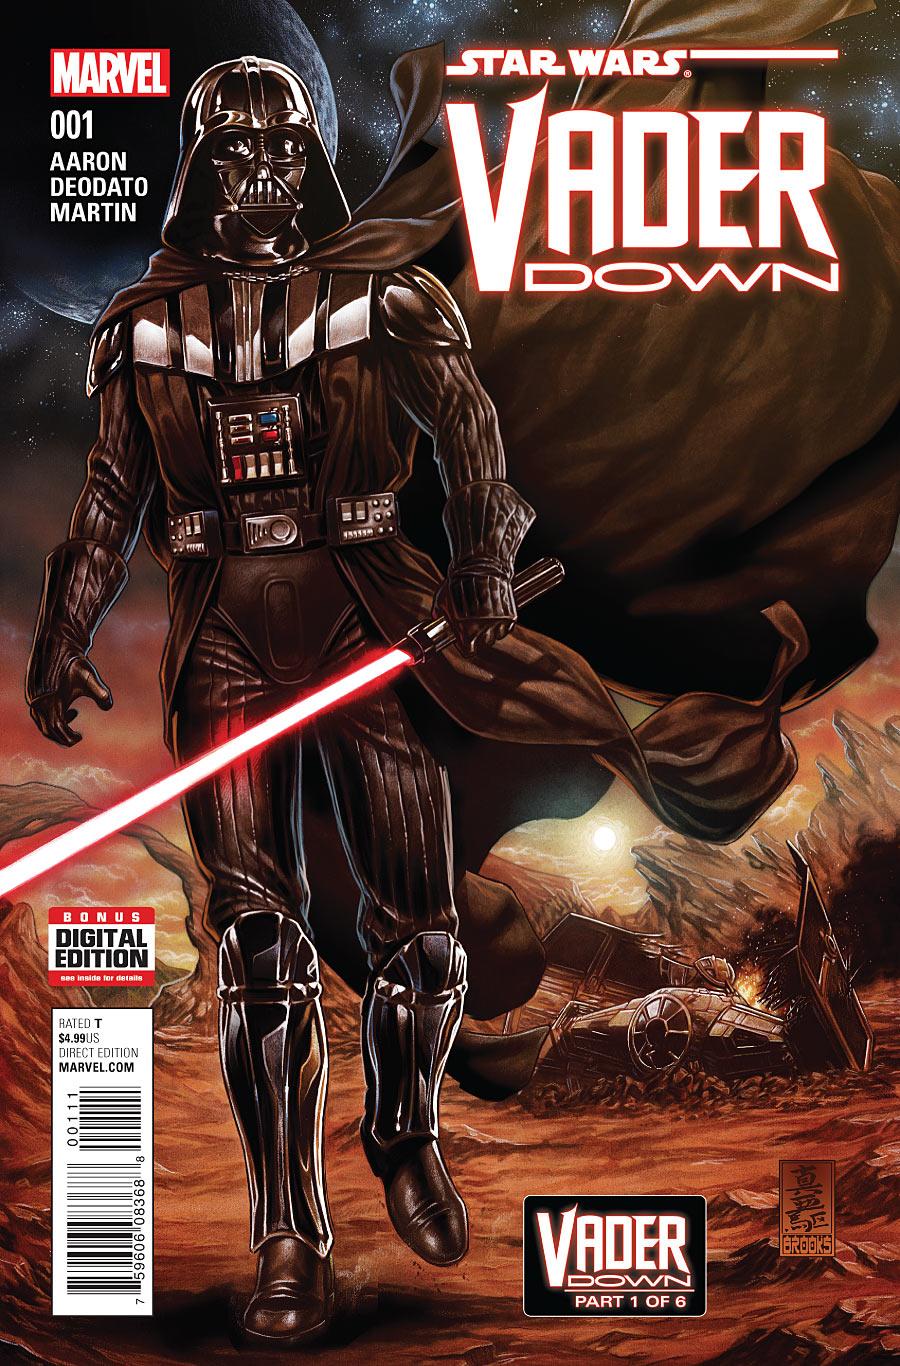 Star Wars Vader Down #1 Blank Variant Marvel Comics 2015